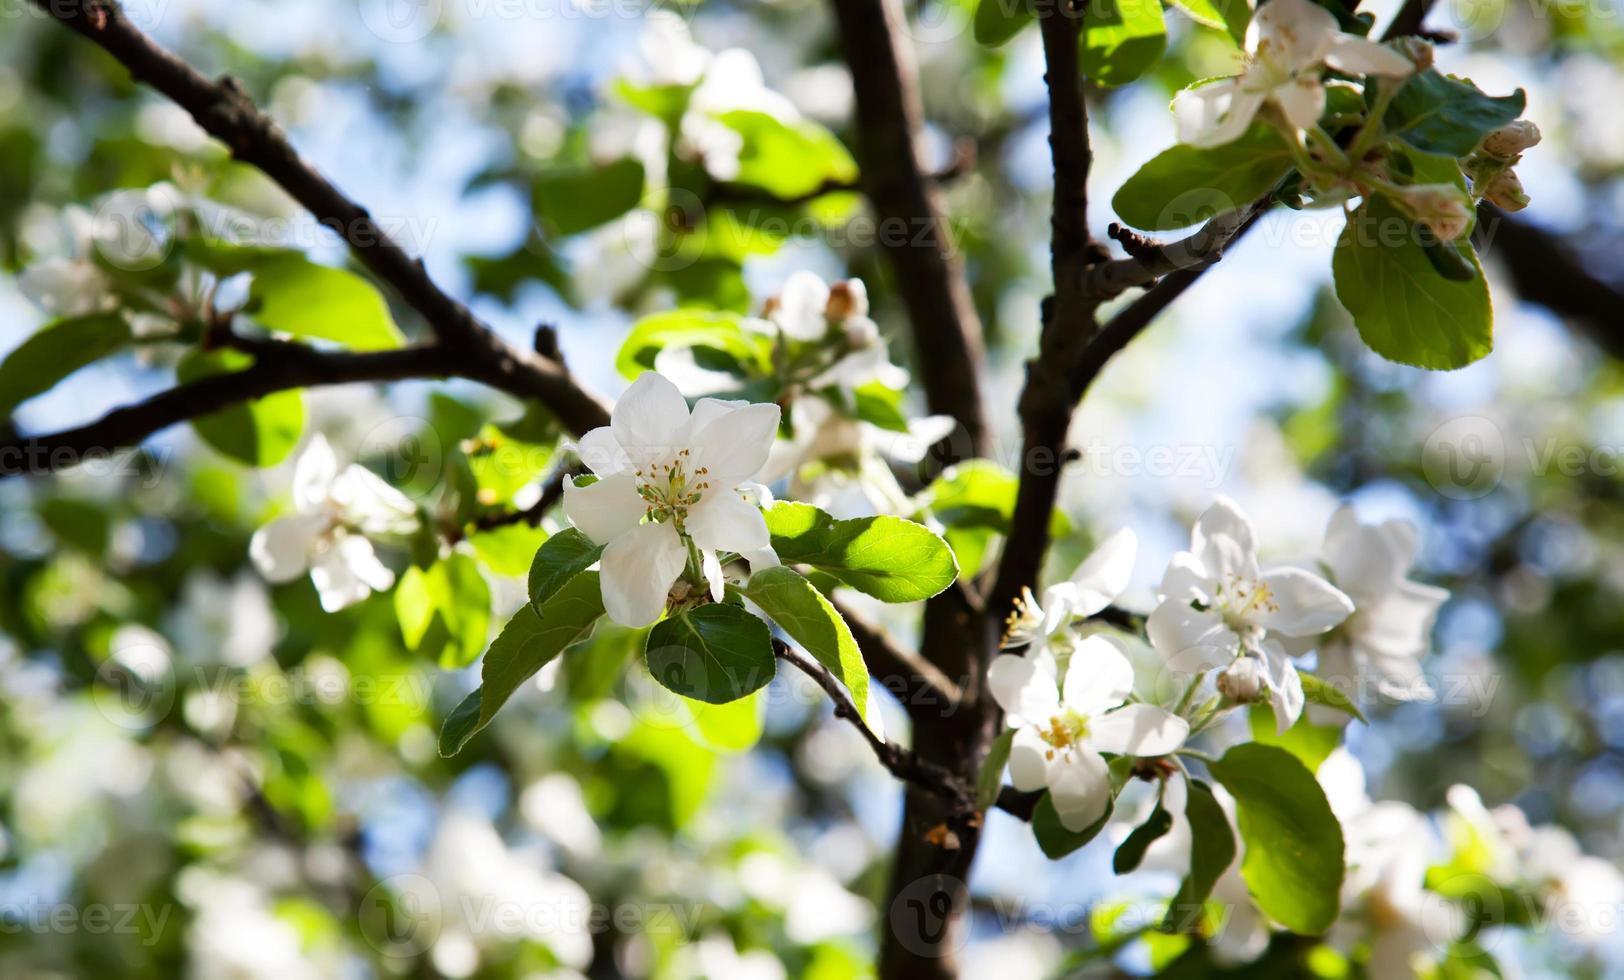 Apfelbaumblüte foto